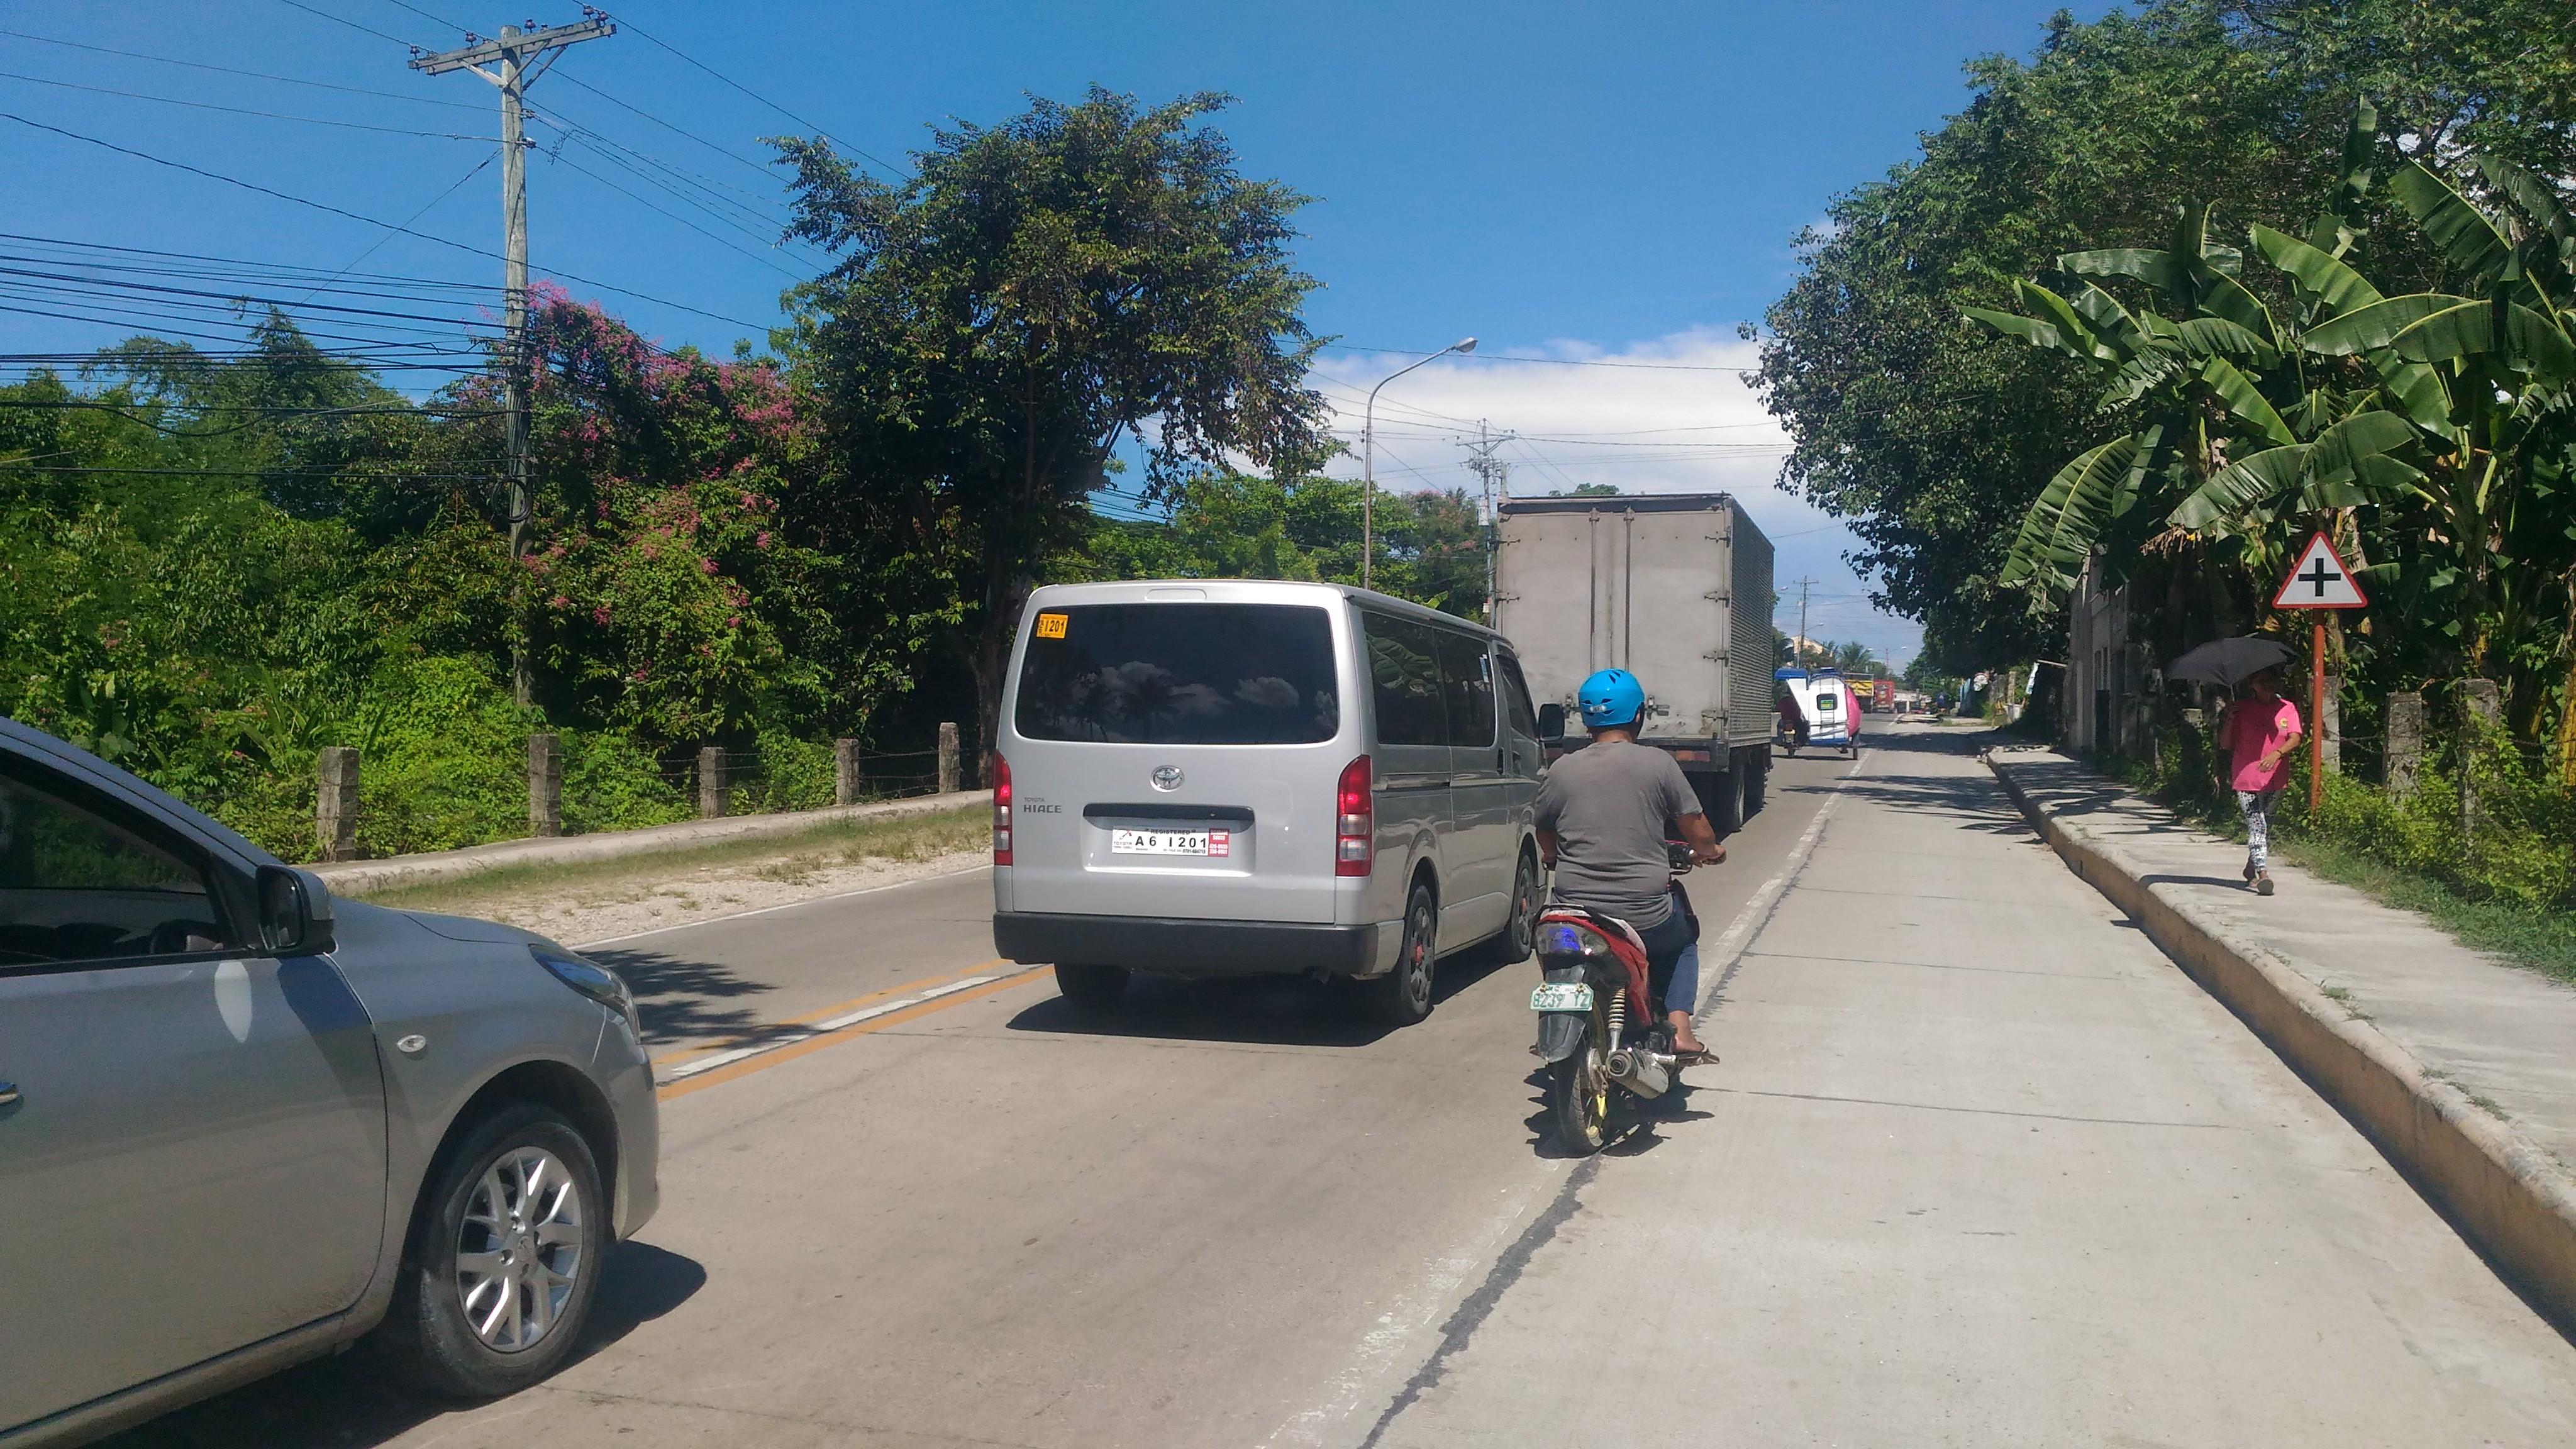 Bogo Commercial lot for sale Bogo City Cebu good for Mall